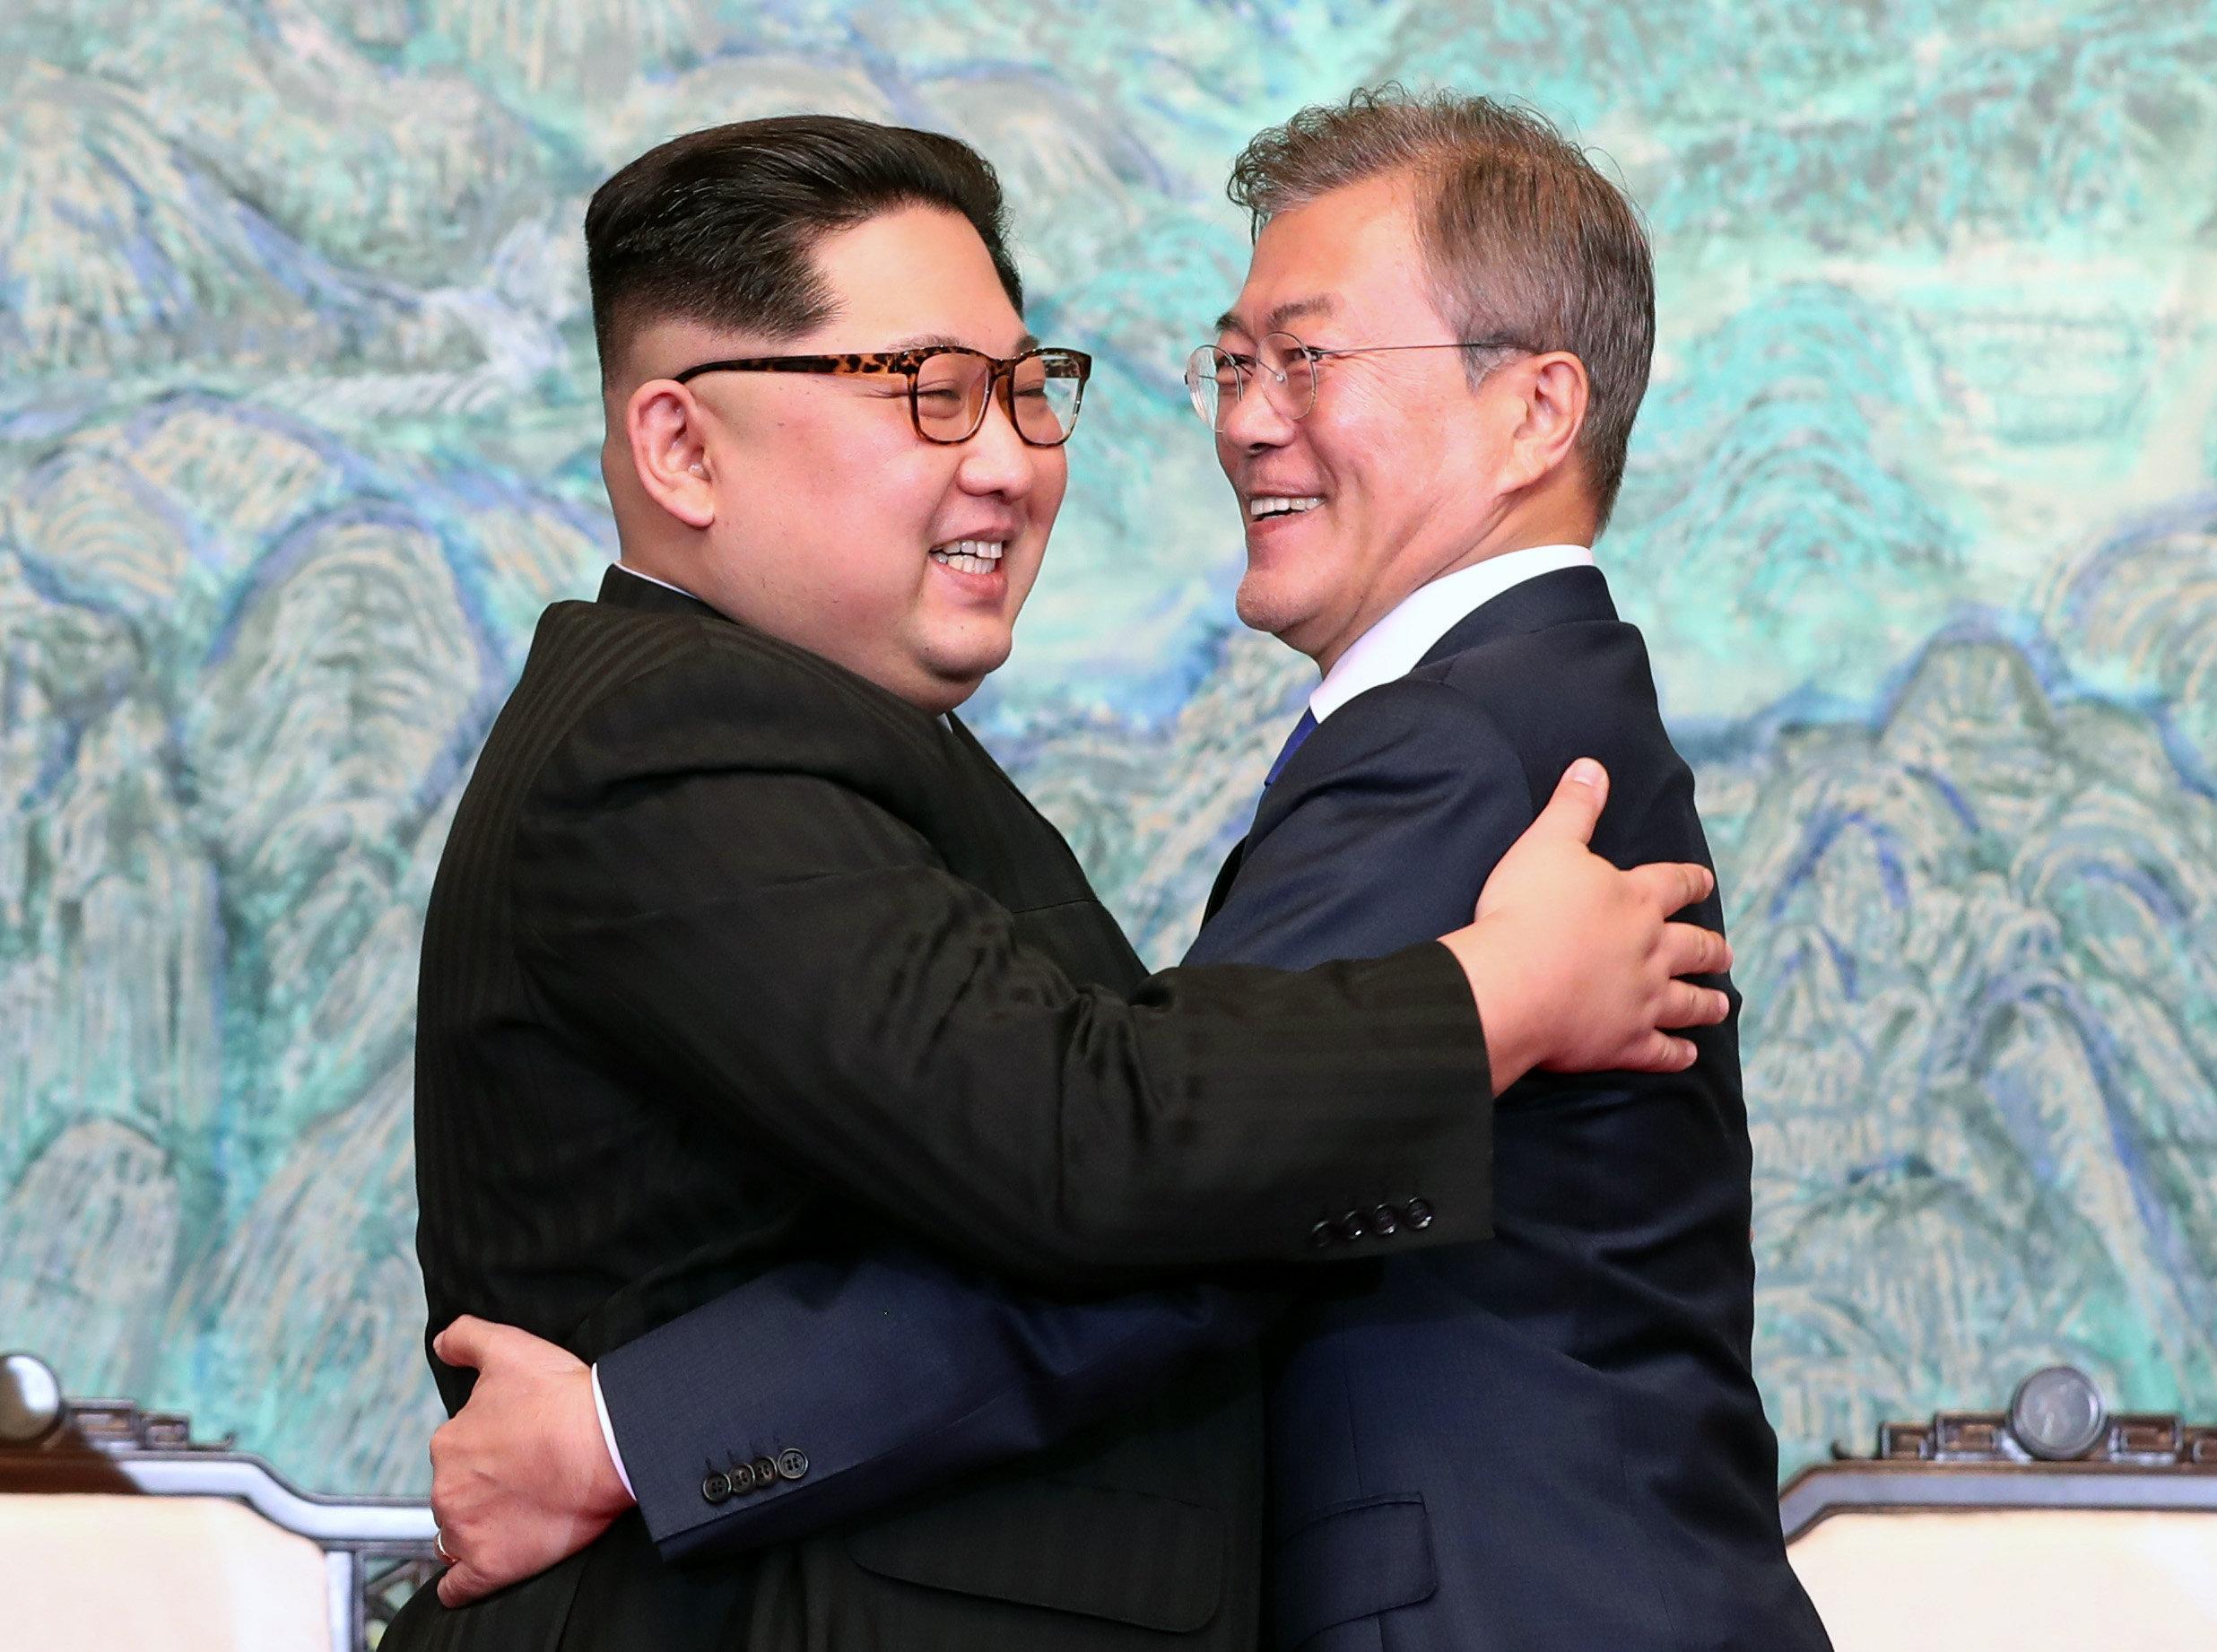 North Korea summit set for June 12 in Singapore, Trump says